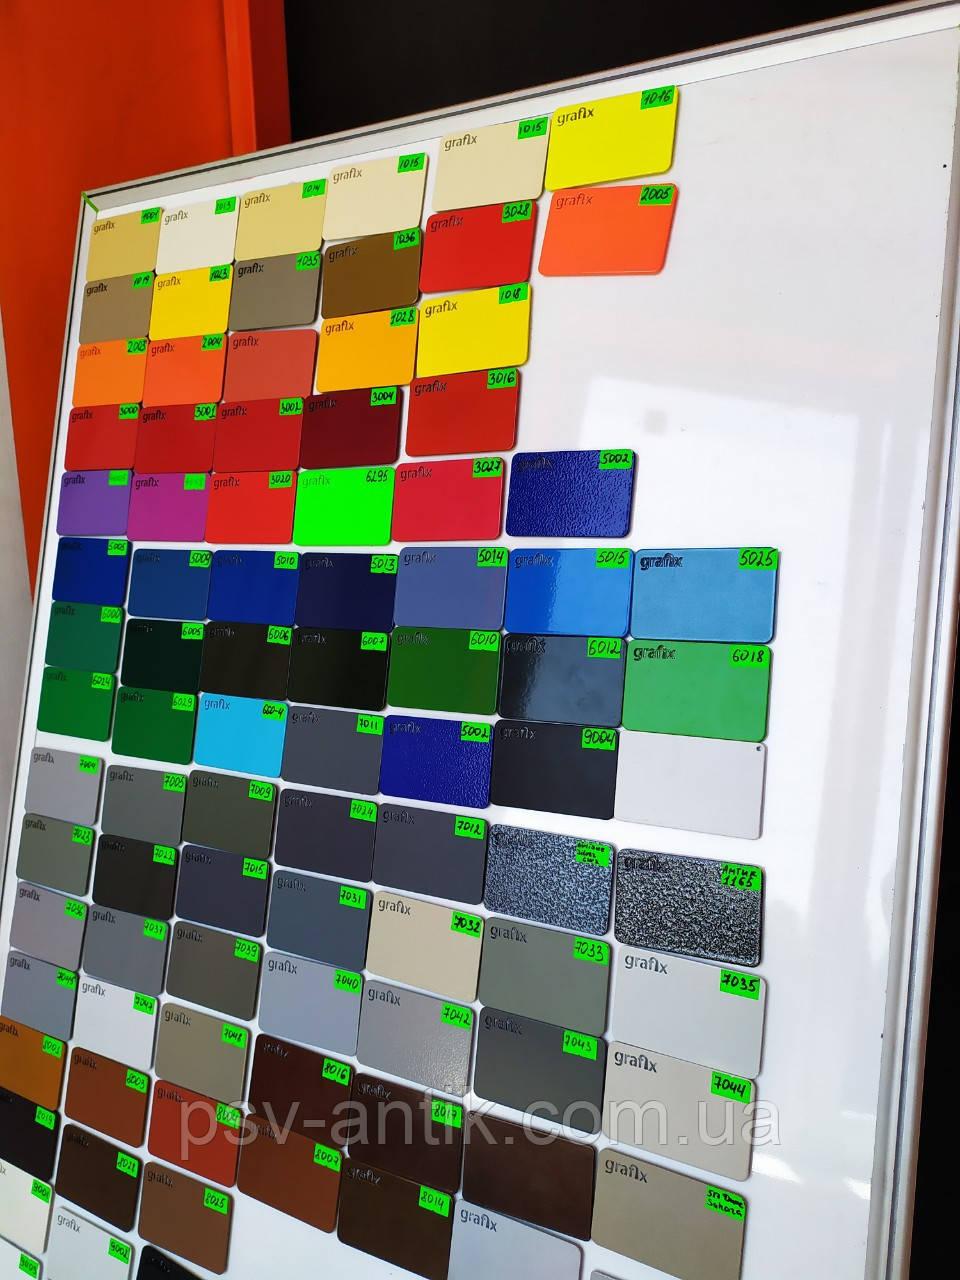 Порошковая краска глянцевая, полиэфирная, архитектурная, 1007